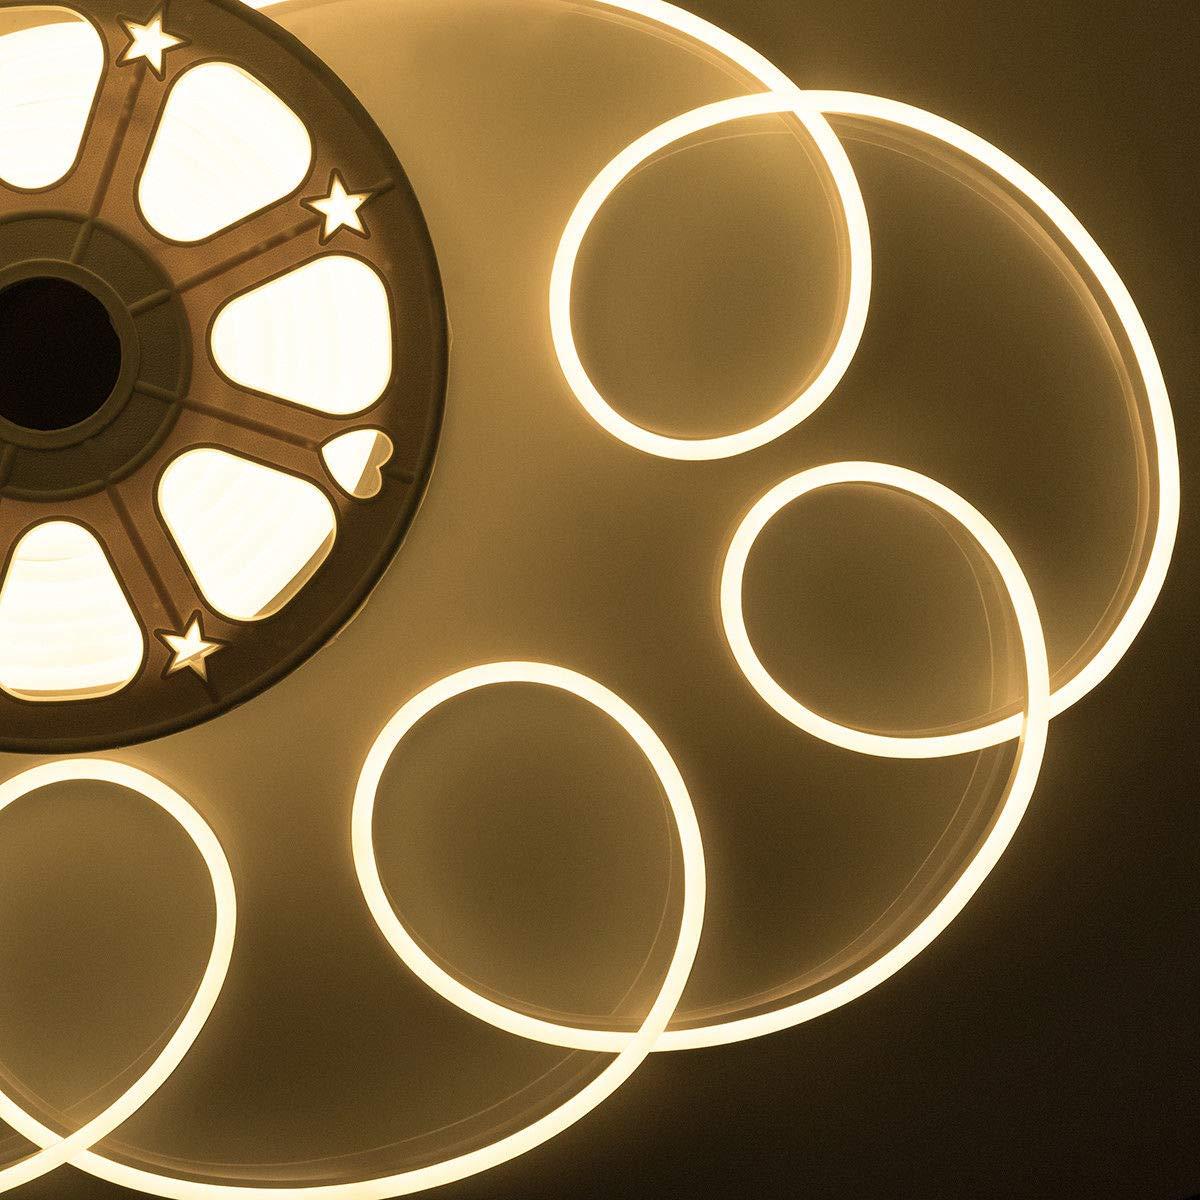 Flexible LED Neon Light SMD2835 120leds/M Waterproof Soft Tube Rope Light Strip AC220V-240V Warm/White/Red/Green/Blue/Pink/RGB